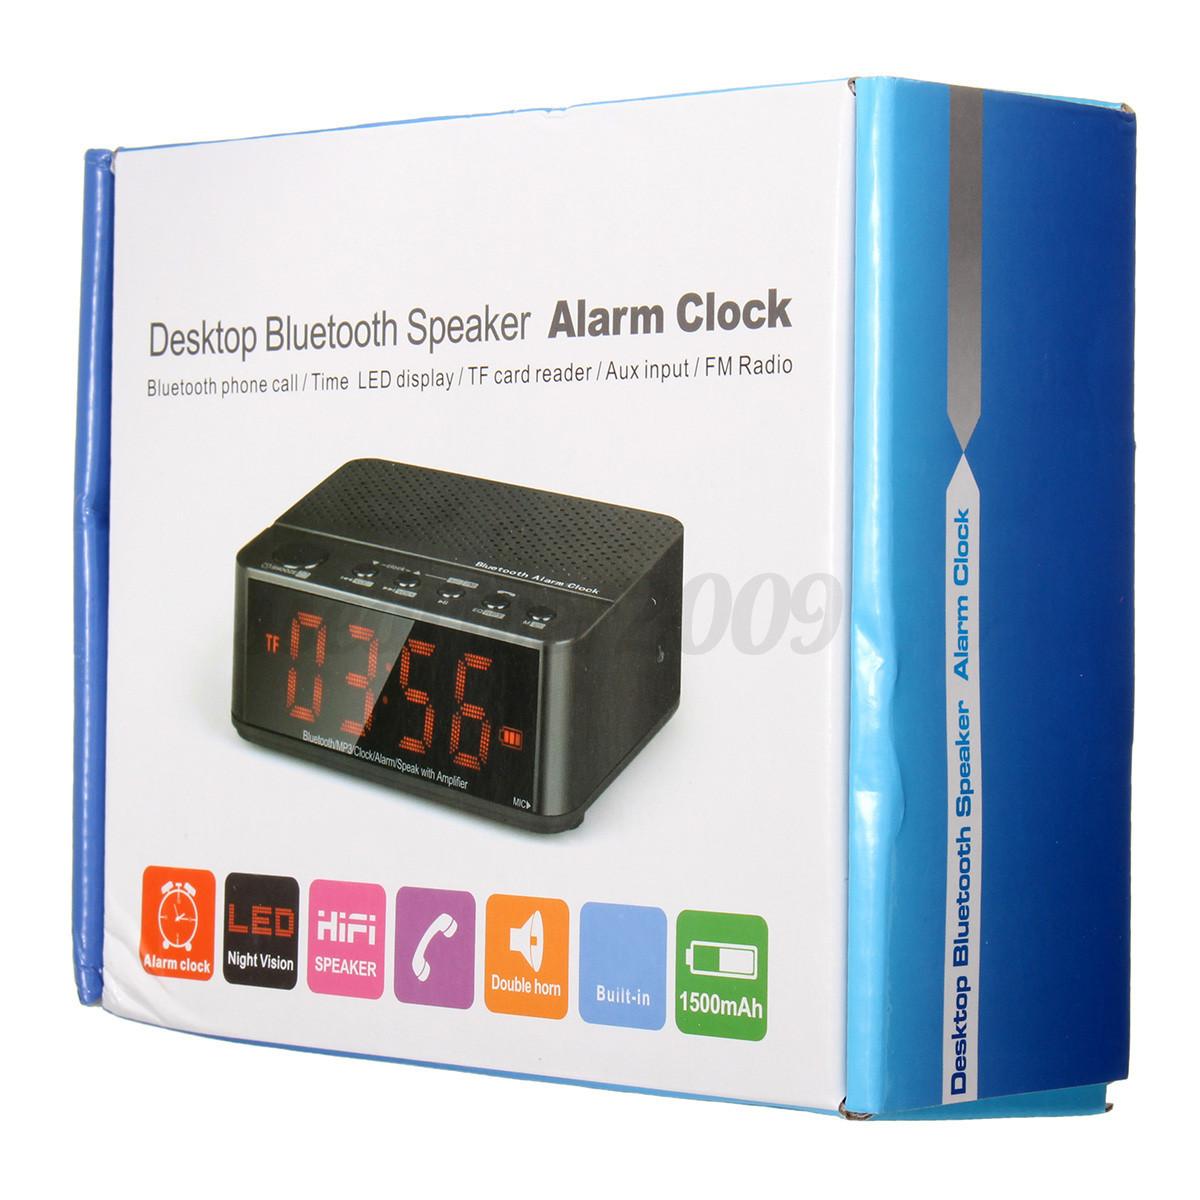 digital led display alarm clock bluetooth speaker fm radio mp3 player tf snooze ebay. Black Bedroom Furniture Sets. Home Design Ideas